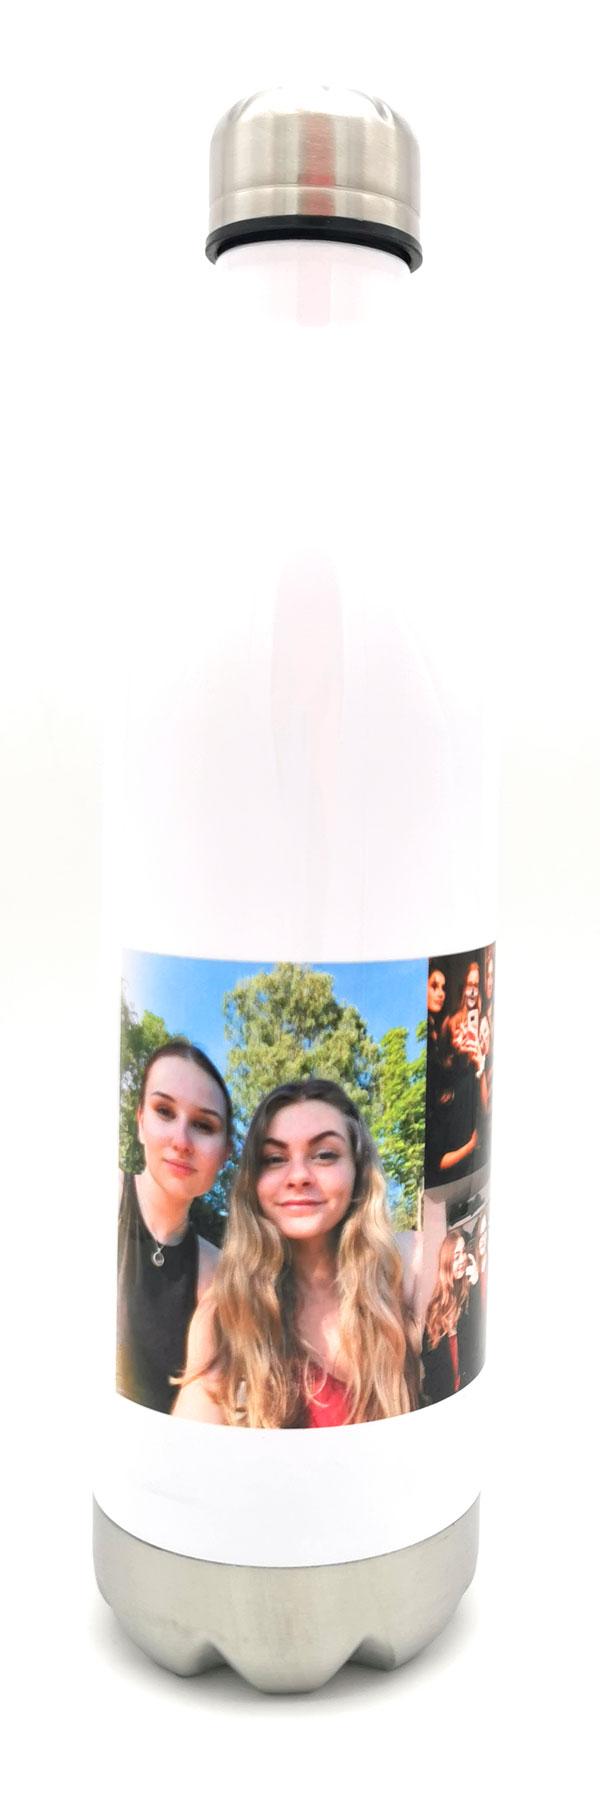 thermoflasche-druckwunder-personalisiertegeschenke-fotodruck-geschenkeonline-plochingen